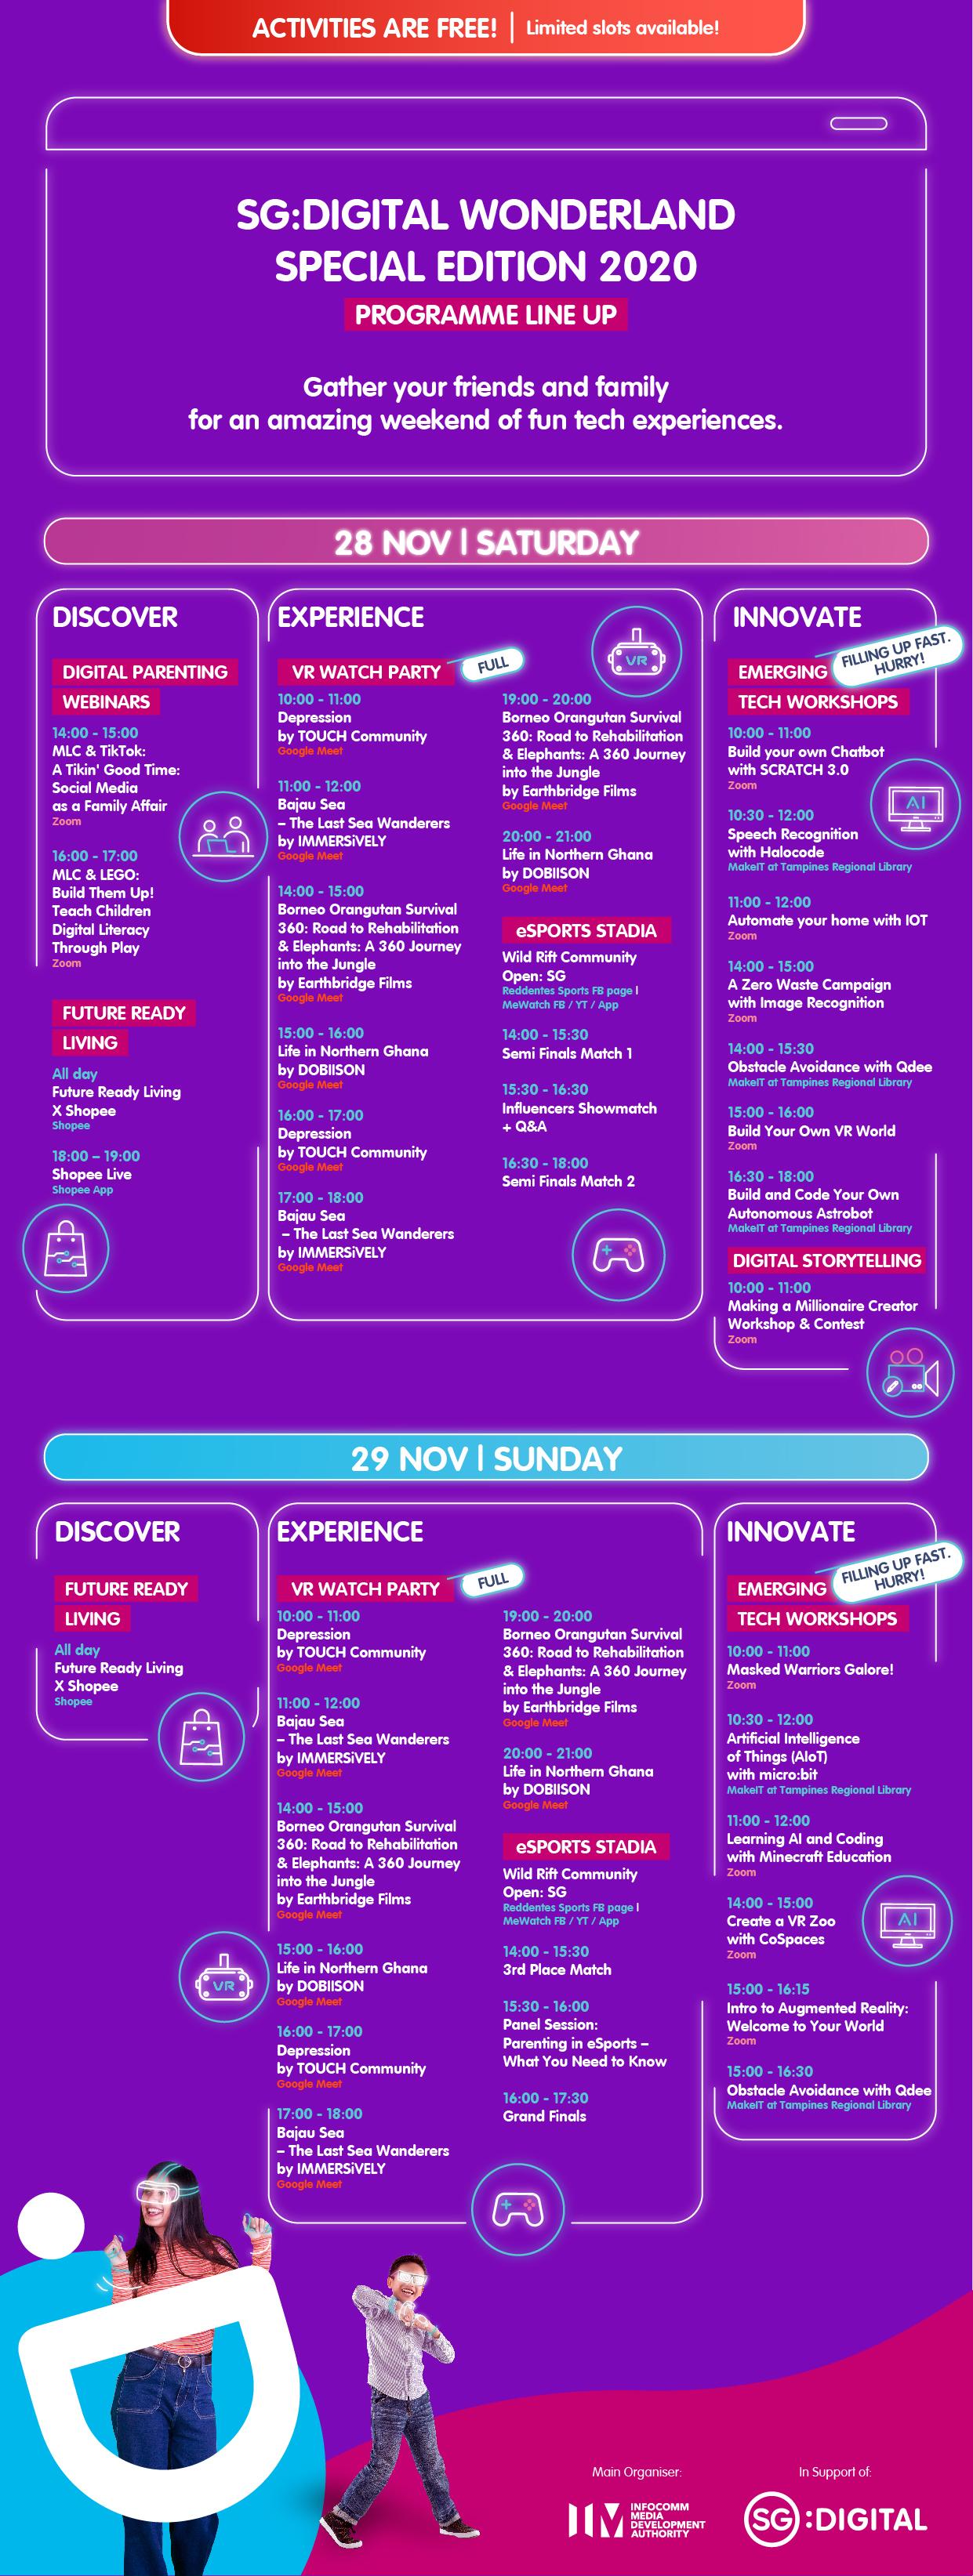 Programme Sheet - Singapore Digital Wonderland 2020